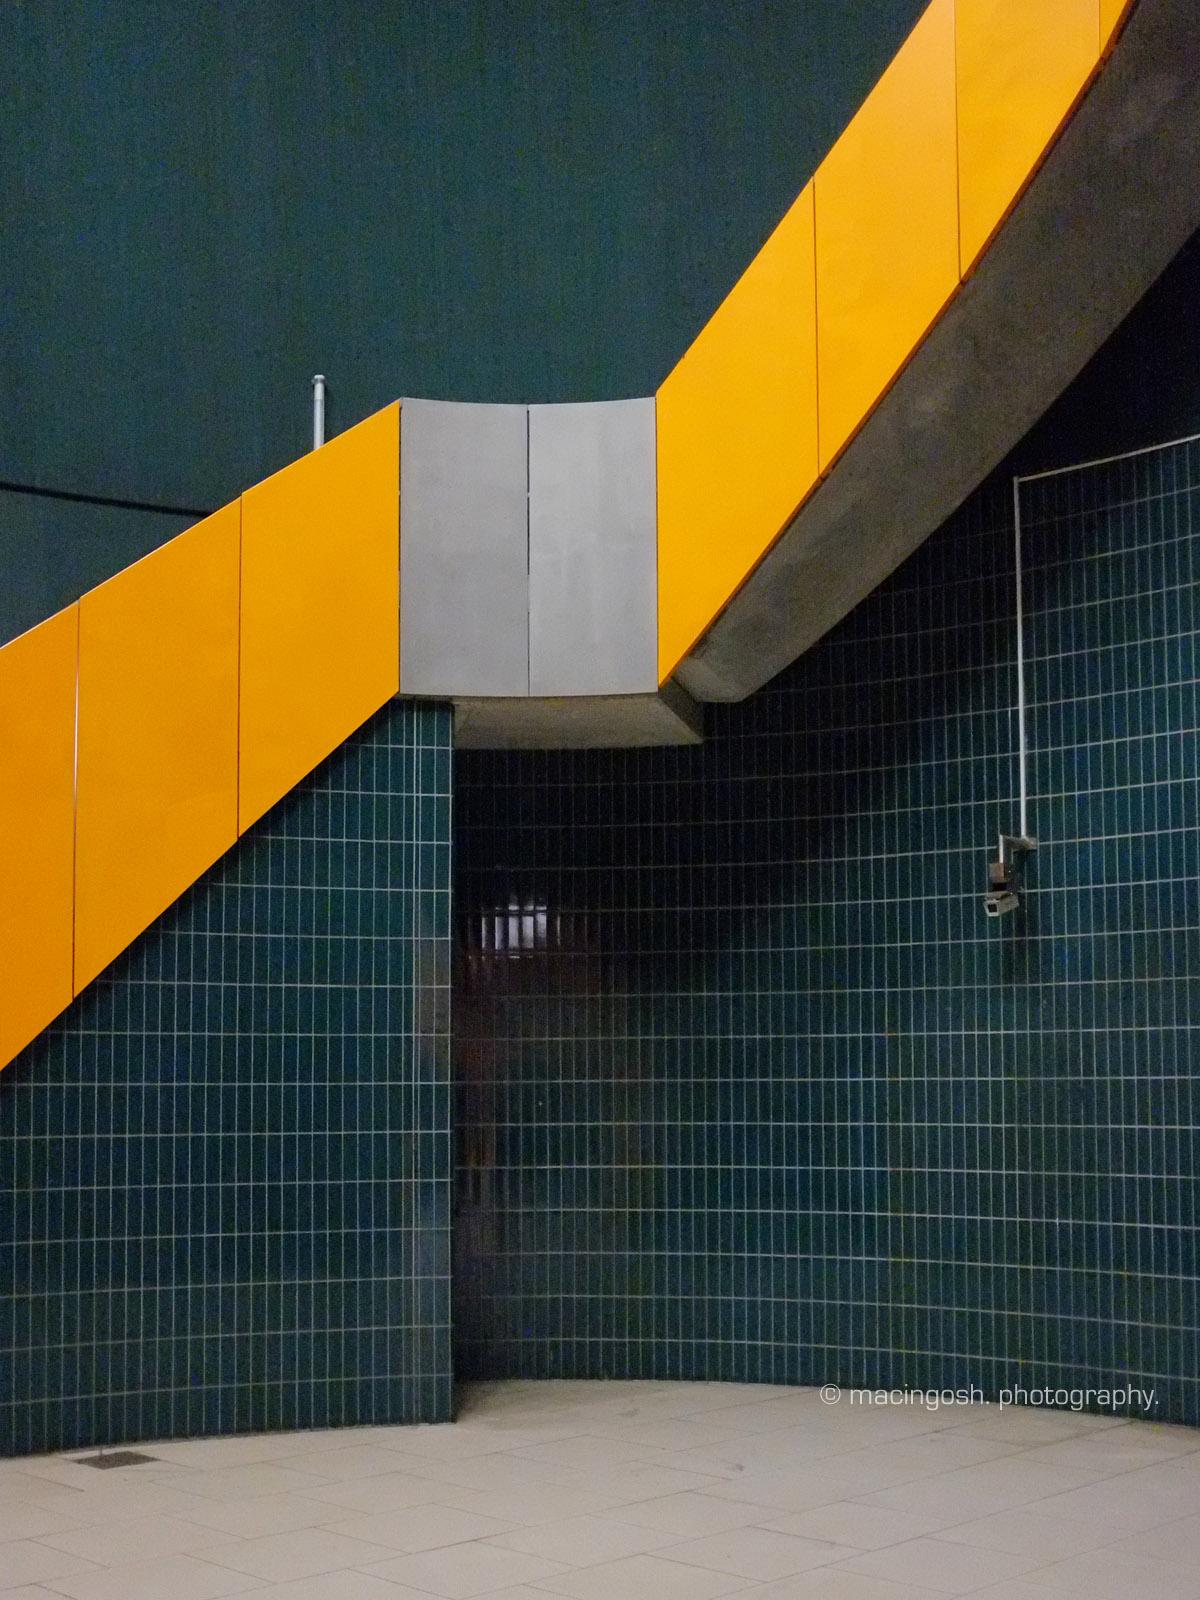 architekturfotografie, macingosh photography, muenchen